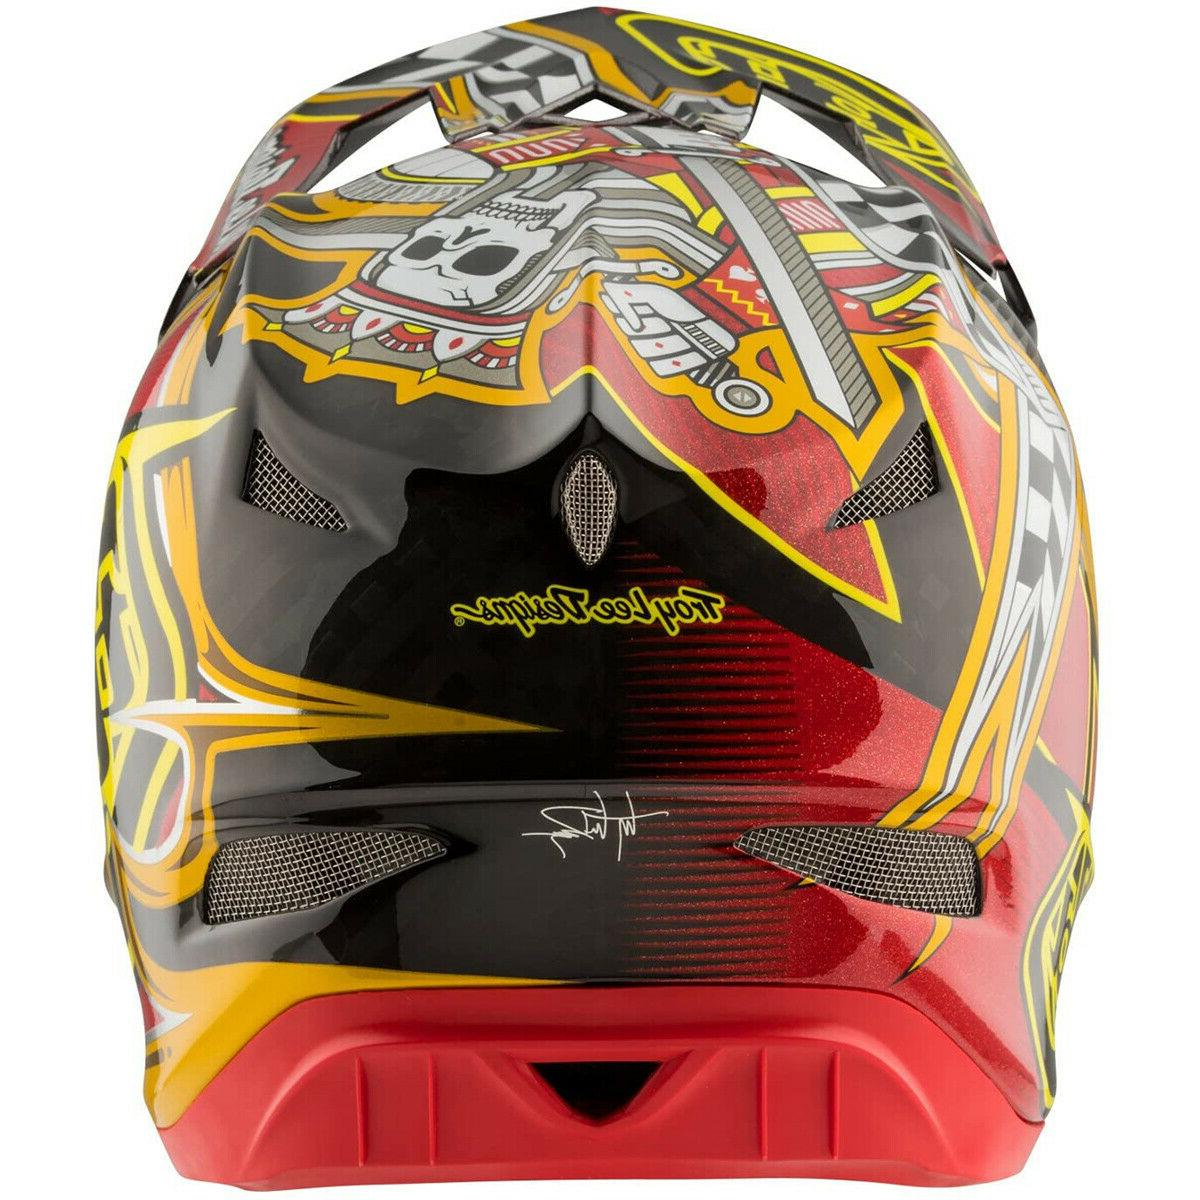 NEW Lee Designs TLD Carbon MTB Helmet